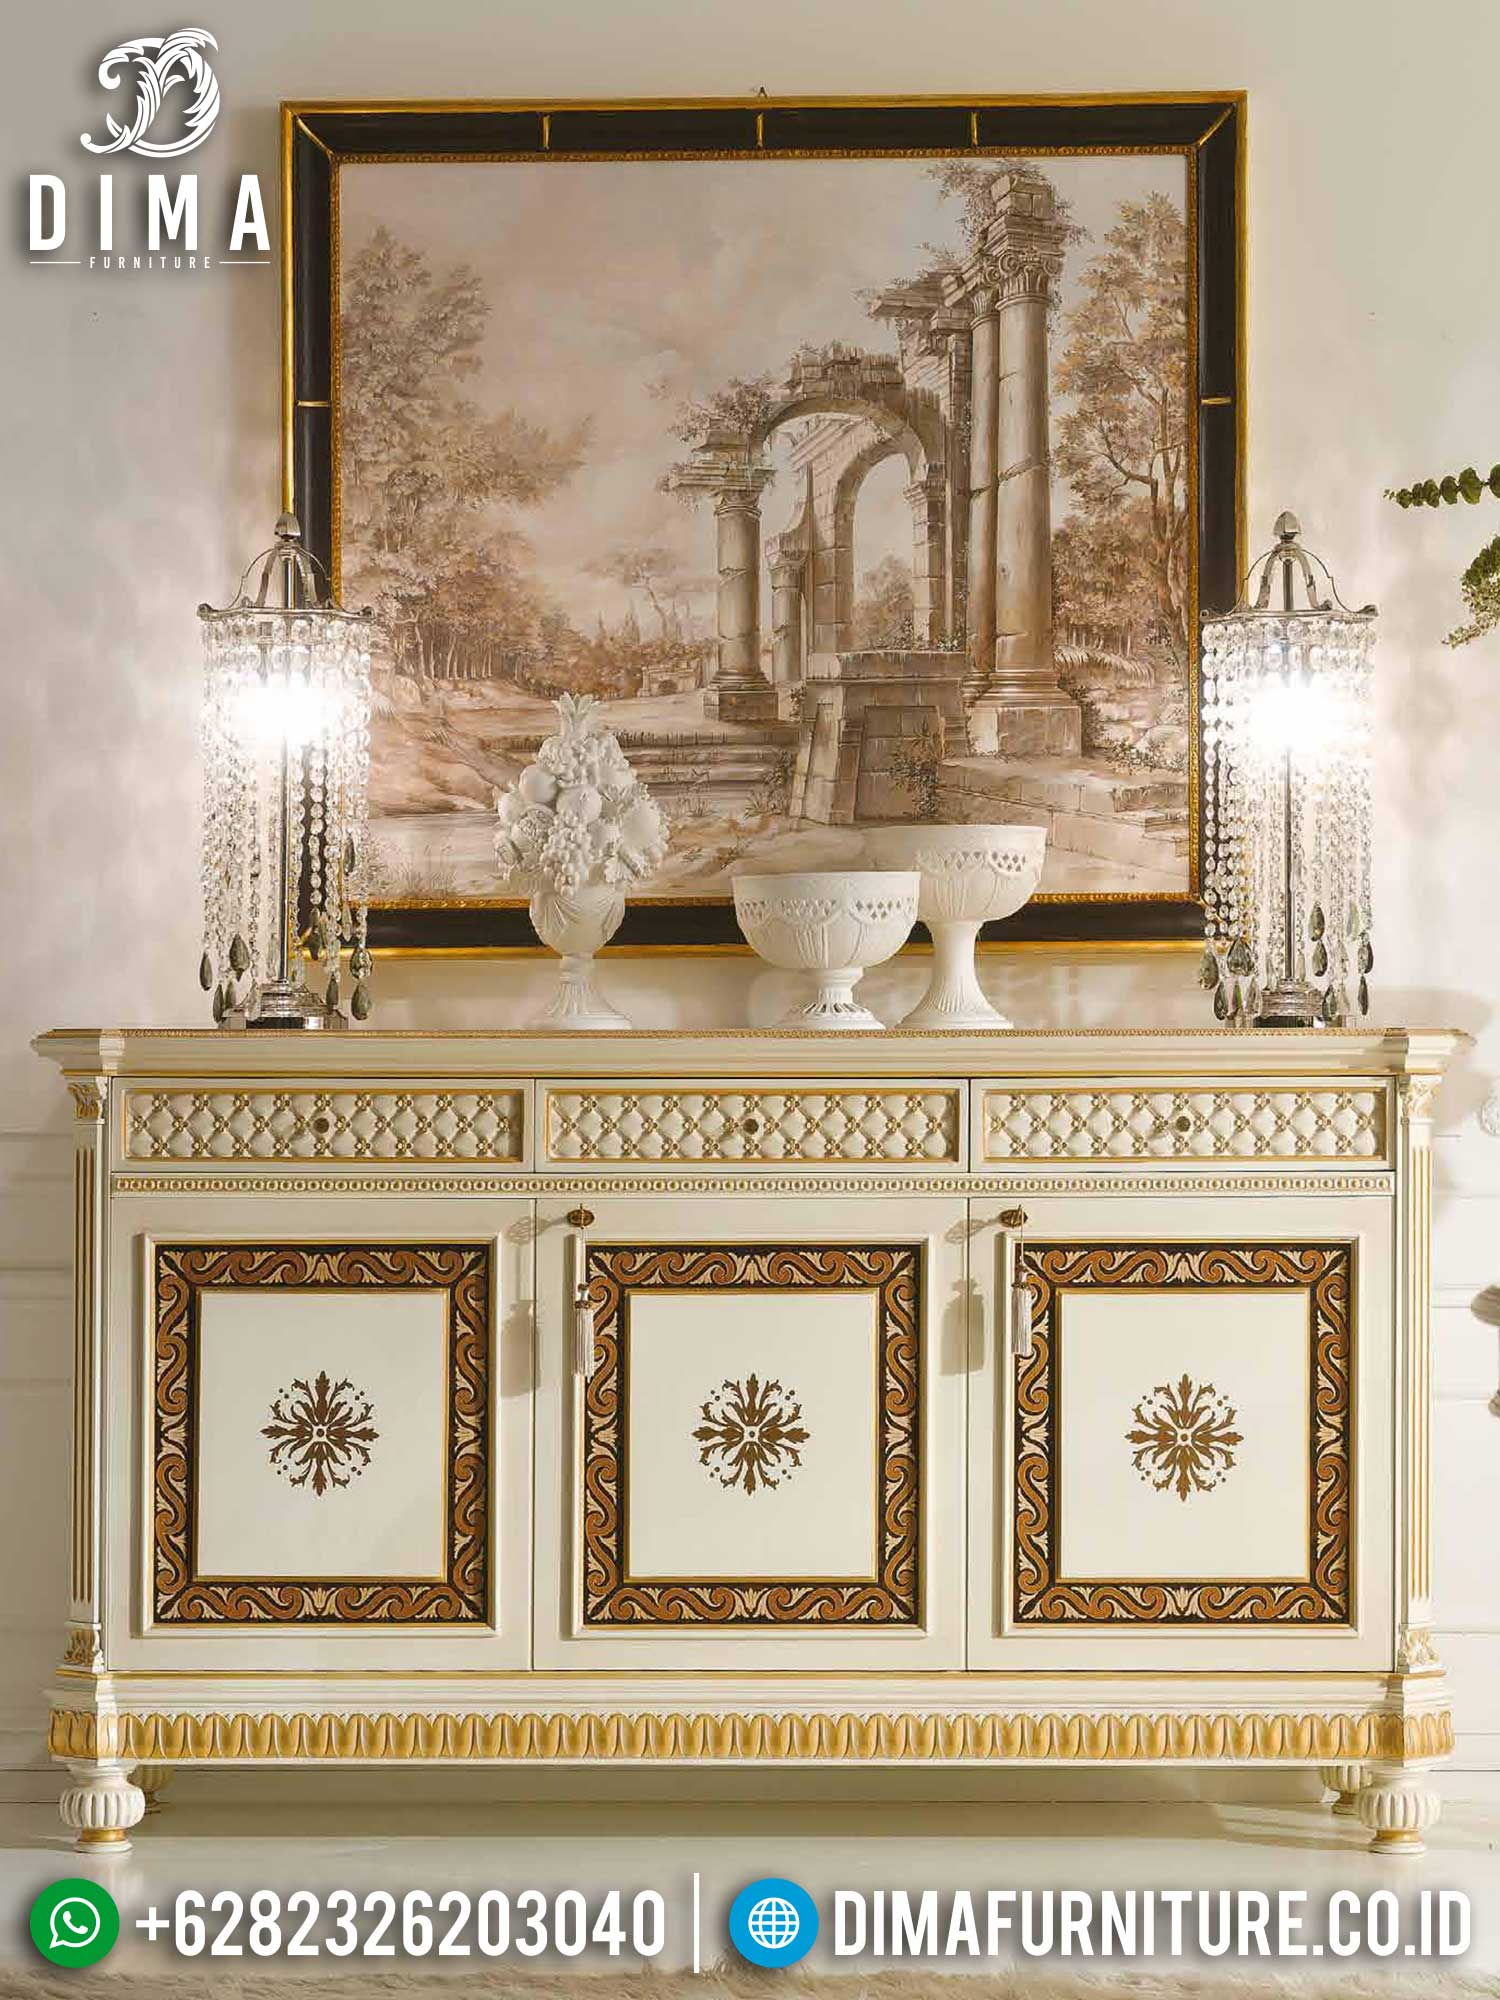 Meja Konsul Ukiran Jepara Luxury Gorgeous Classic Style Furniture Jepara TTJ-1393